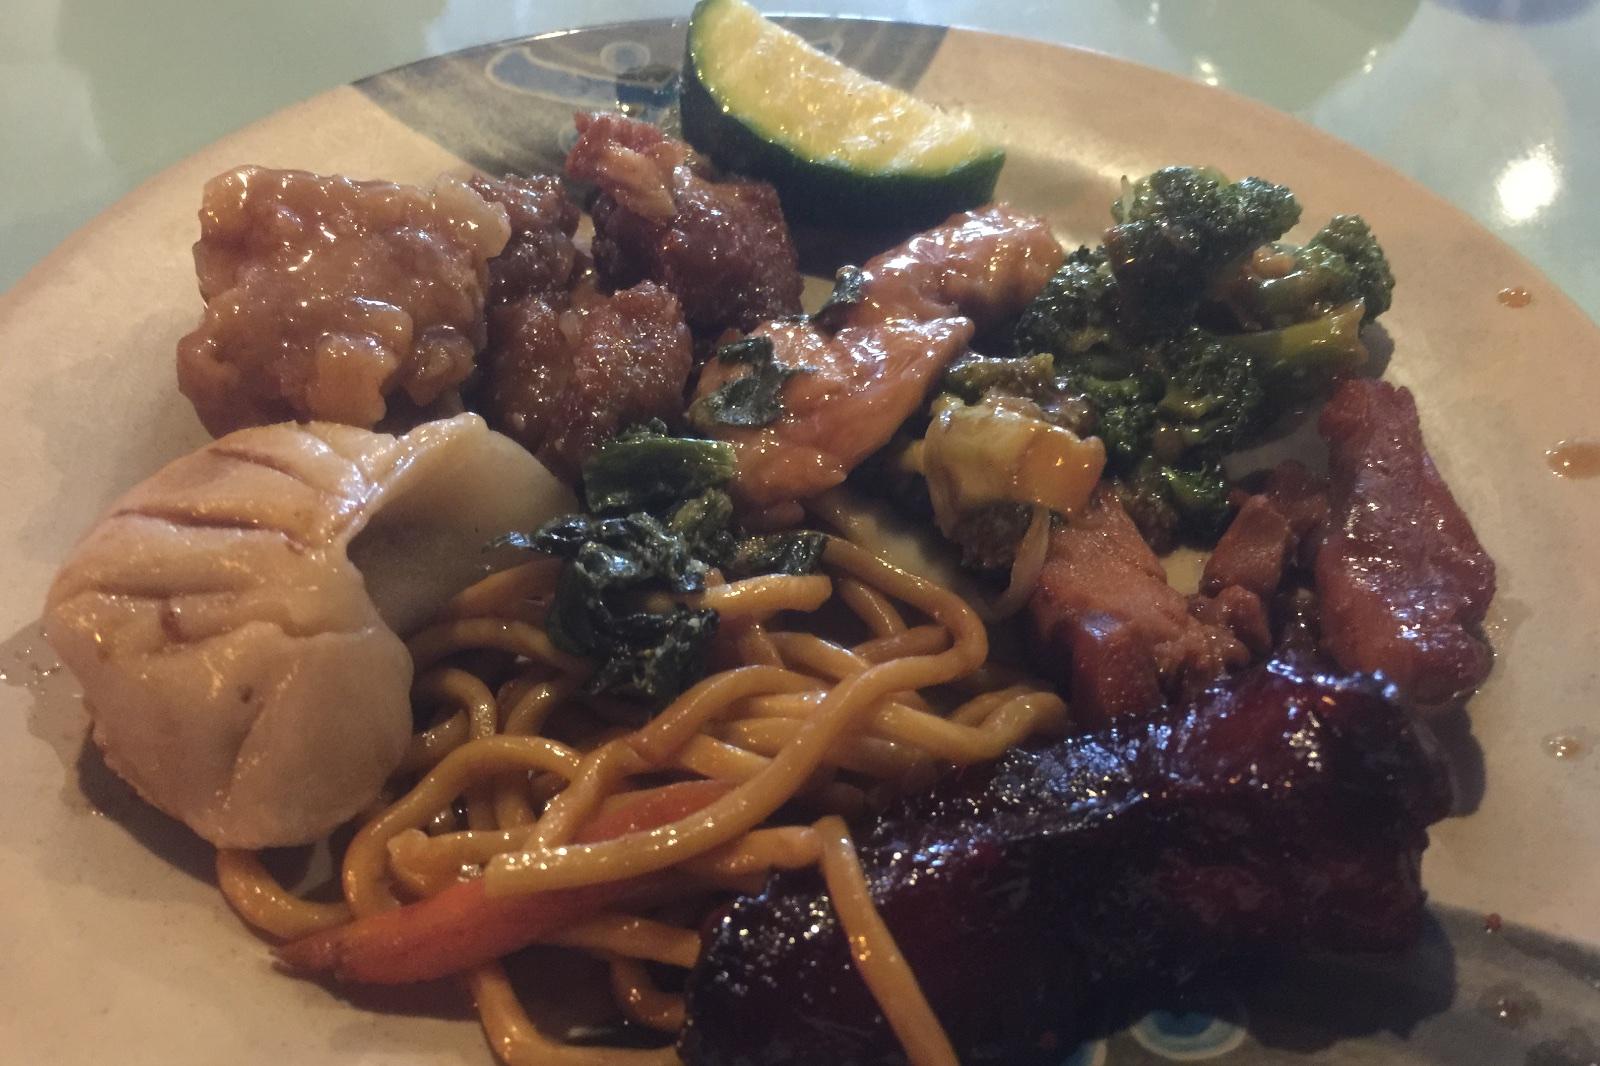 http://blog.rickk.com/food/2016/07/28/ate.2016.07.10.d.jpg